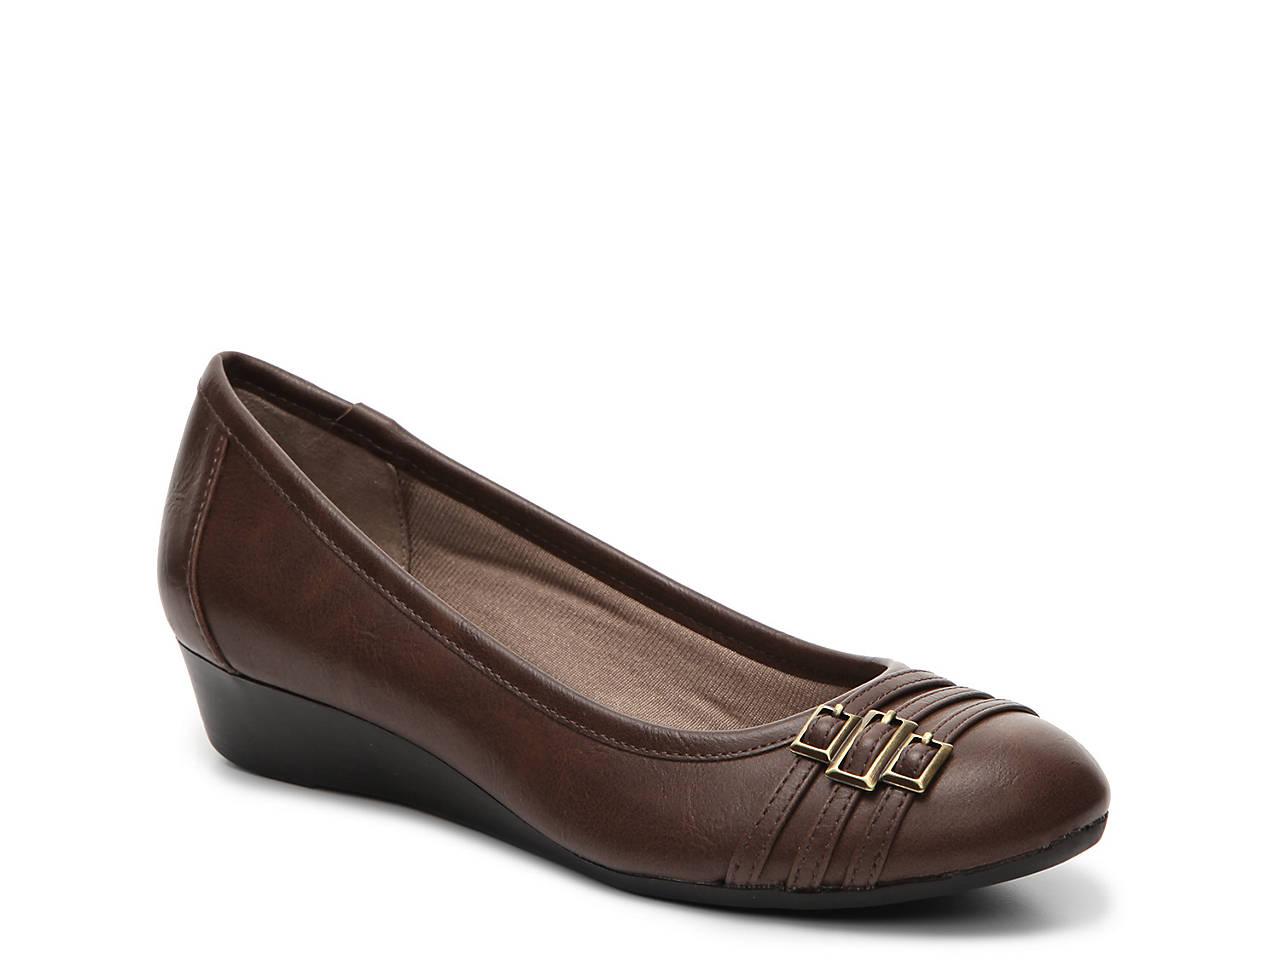 bd072efd075 LifeStride Farrow Wedge Pump Women s Shoes